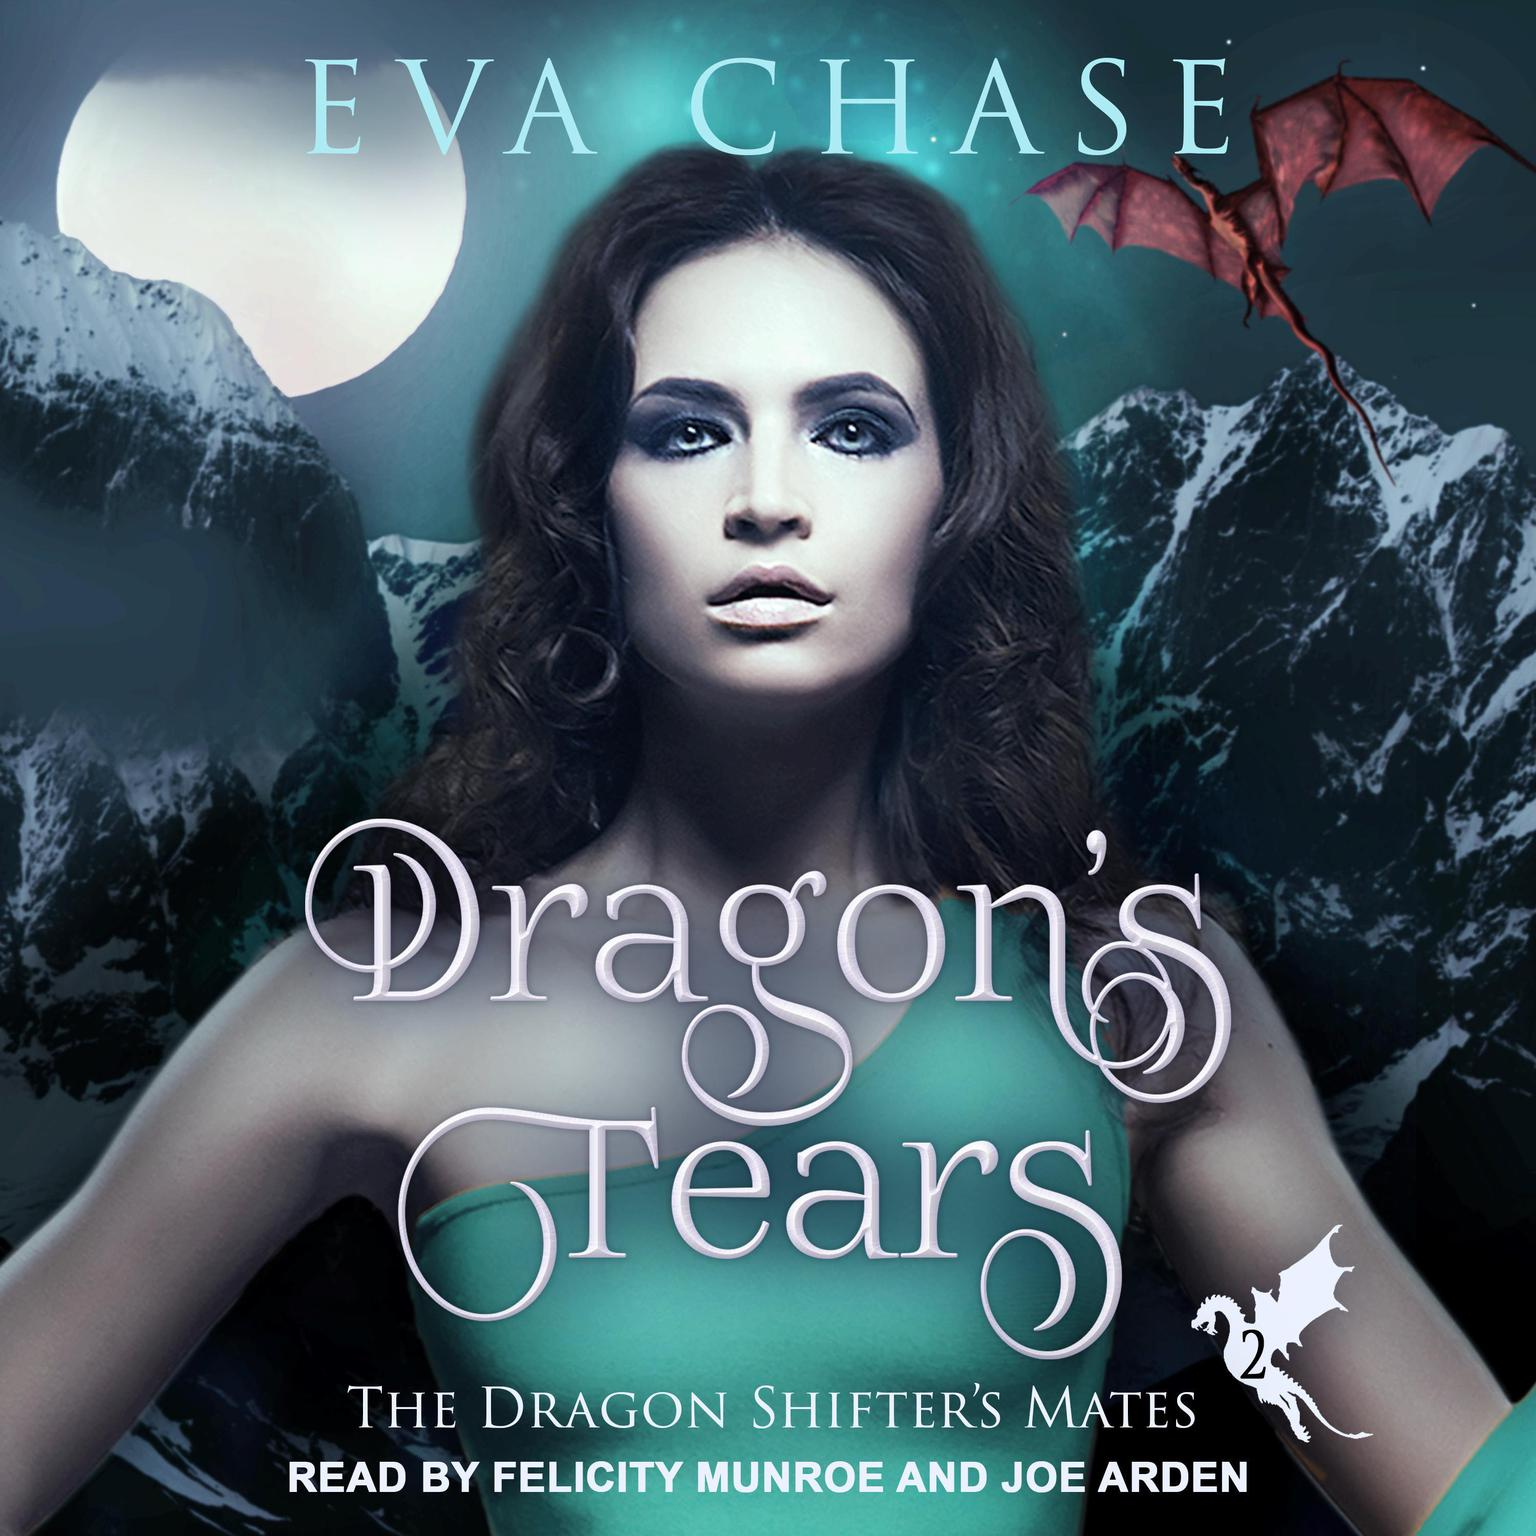 Printable Dragon's Tears: A Reverse Harem Paranormal Romance Audiobook Cover Art